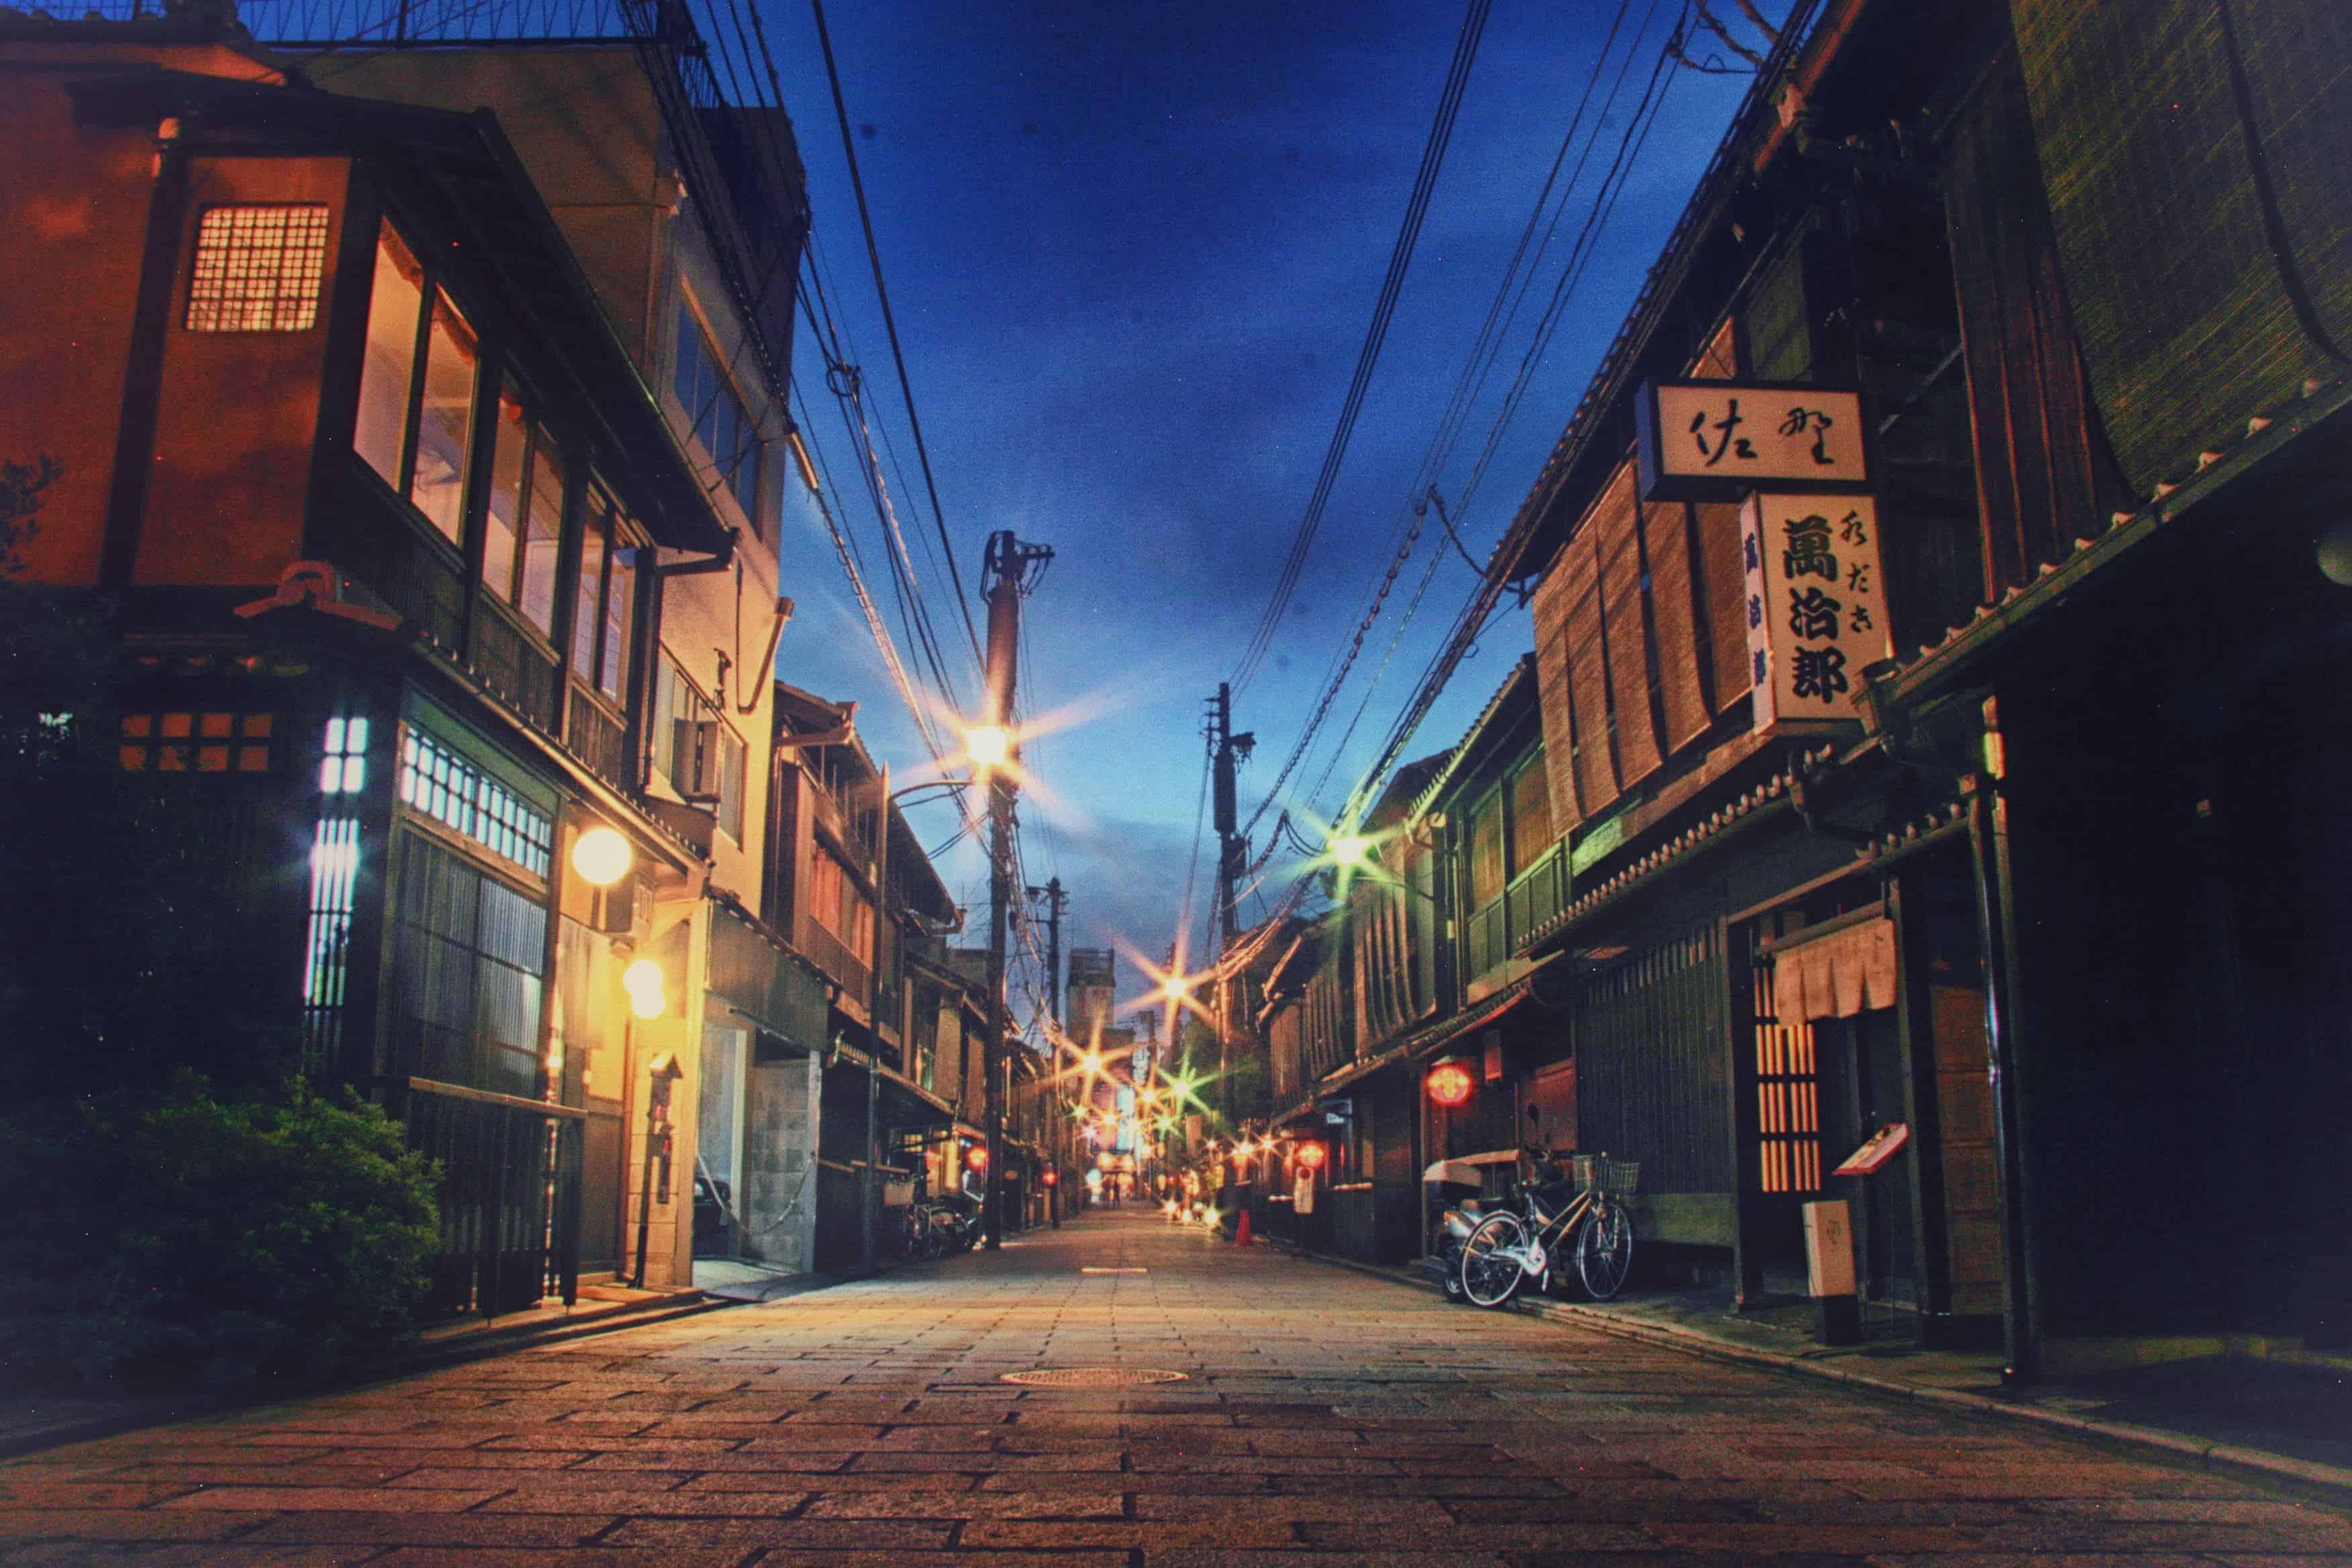 Kyoto Night